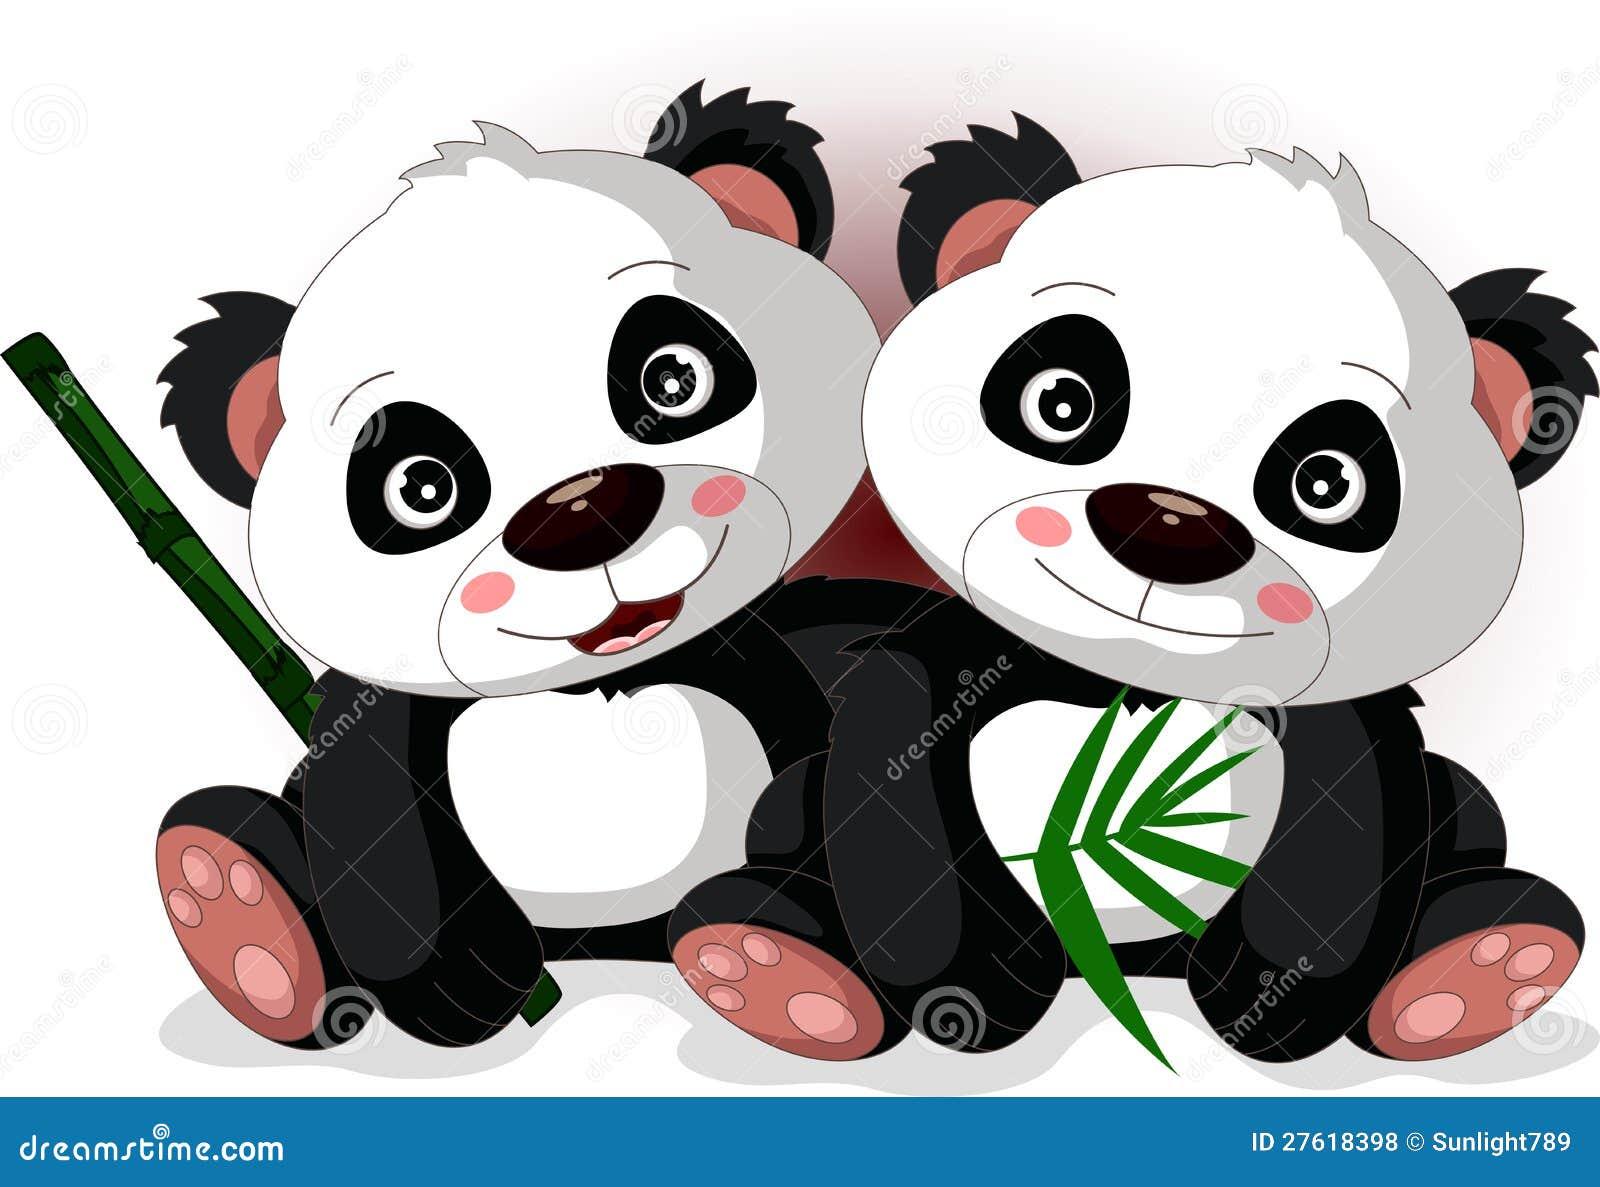 le fr re du panda mignon de dessin anim illustration stock illustration du noir curieux. Black Bedroom Furniture Sets. Home Design Ideas